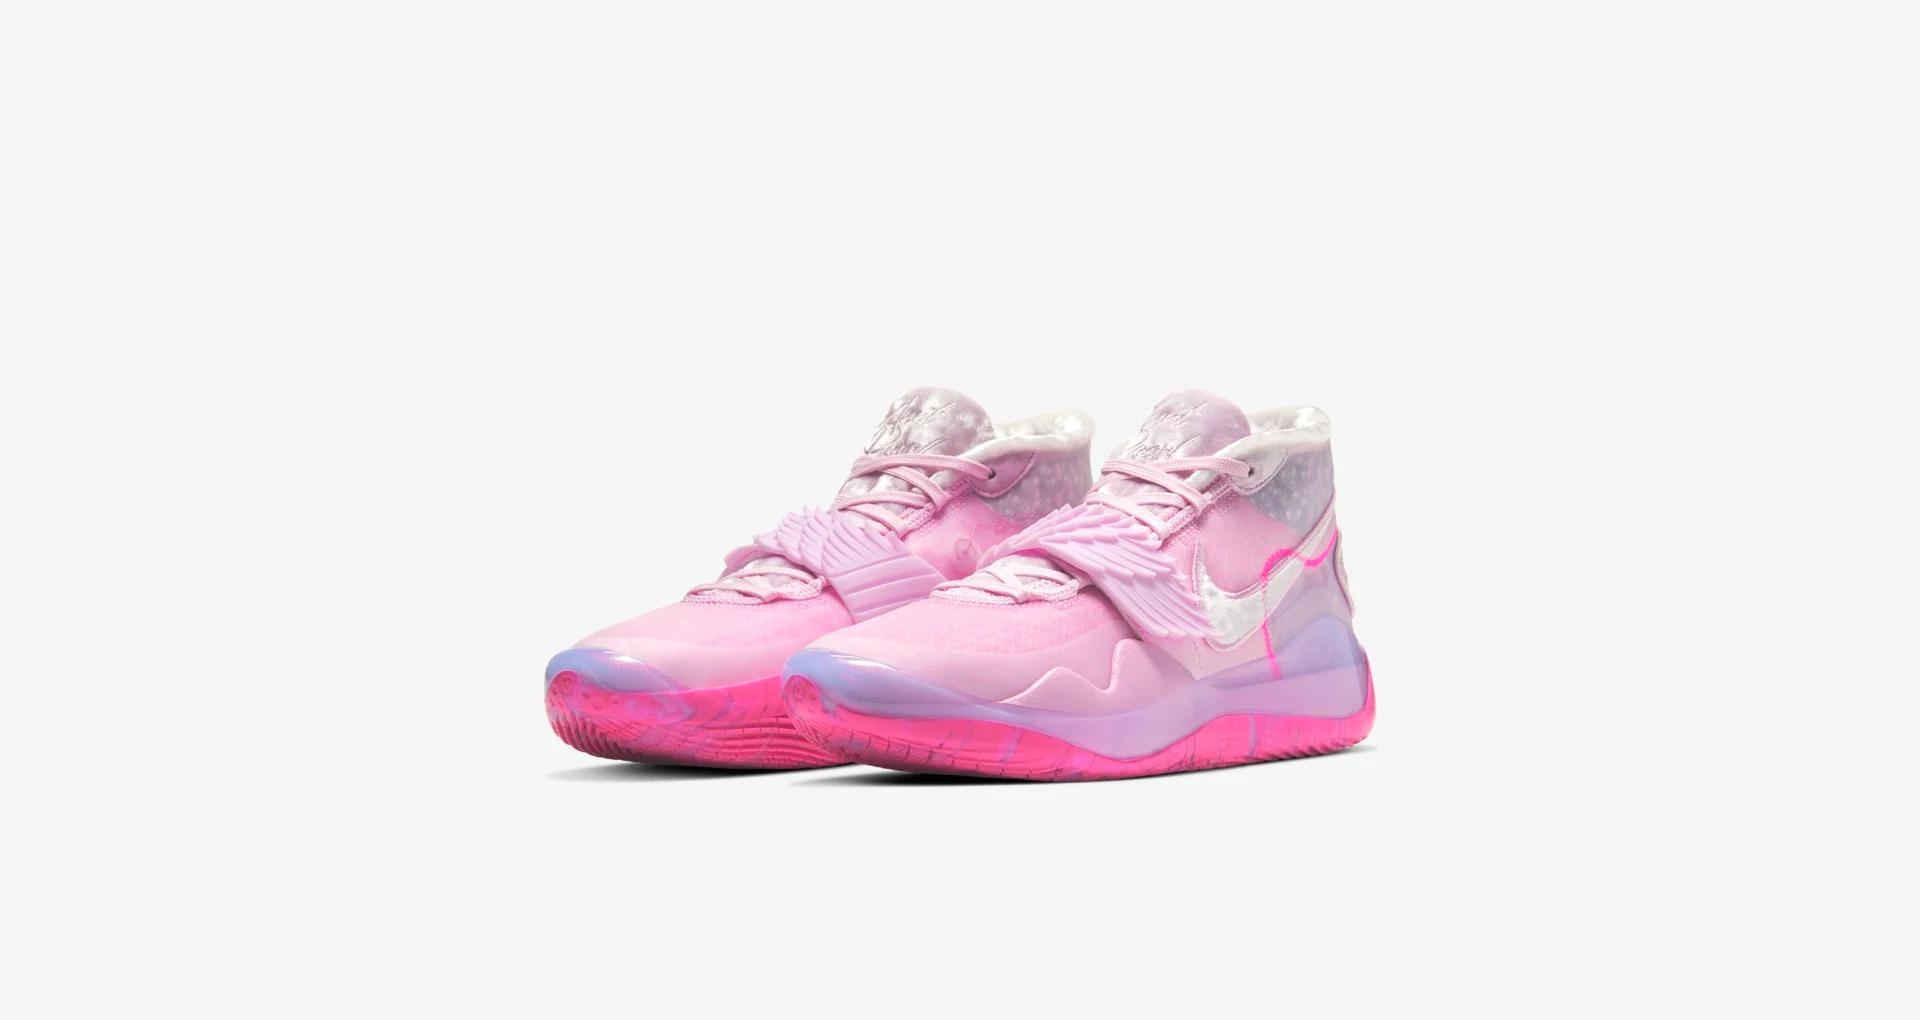 Nike,KD12,Dunk SB,Air Jordan 6 外星人 Dunk SB、抗乳腺癌 KD12 领衔!明早发售的狠货不少!